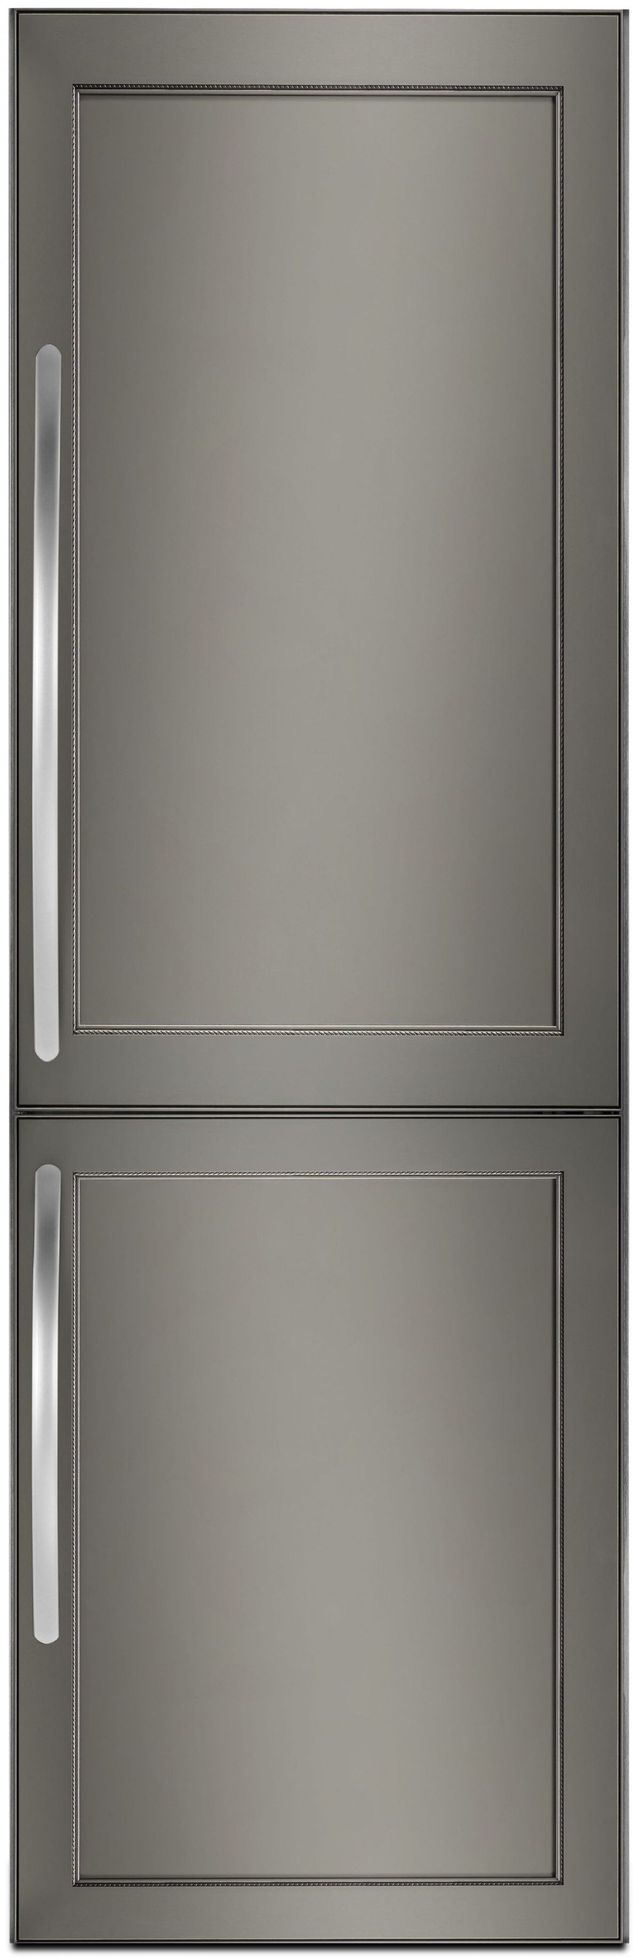 KitchenAid® 9.95 Cu. Ft. Panel Ready Built In Bottom Mount Refrigerator-KBBX104EPA